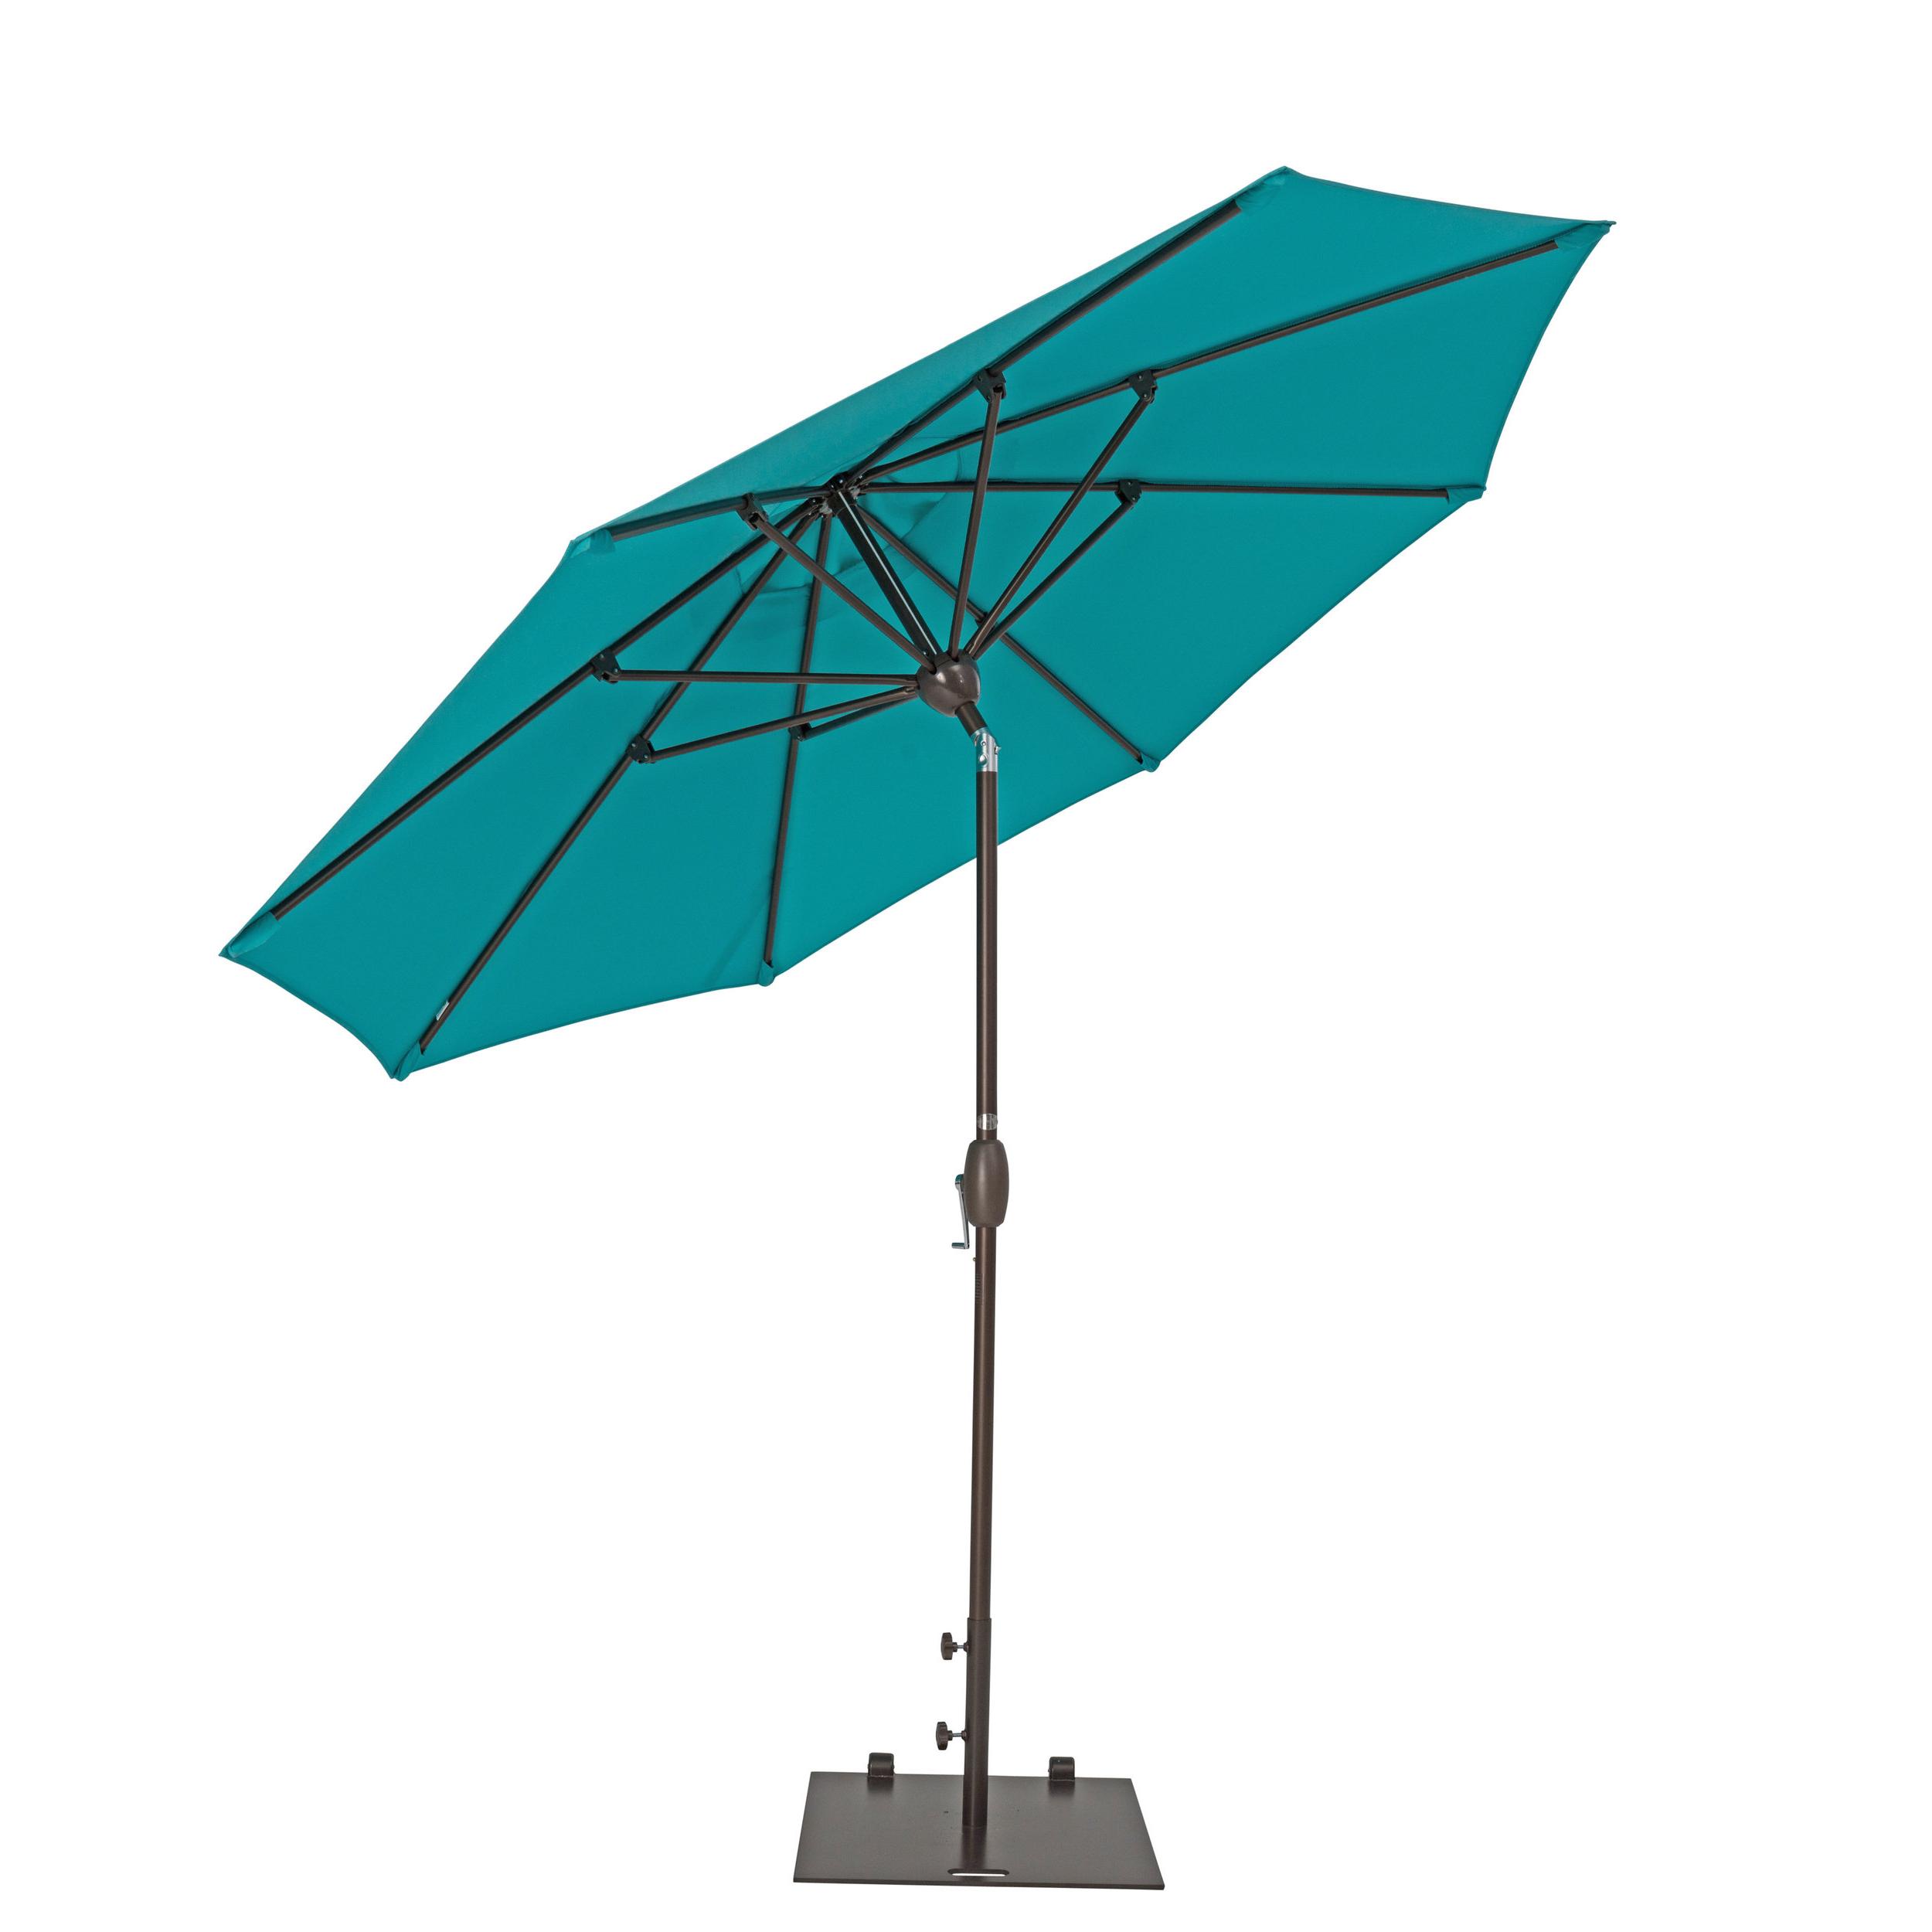 Alyssa Freeport Park Market Umbrellas Intended For Newest Watford 9' Market Umbrella (View 2 of 20)